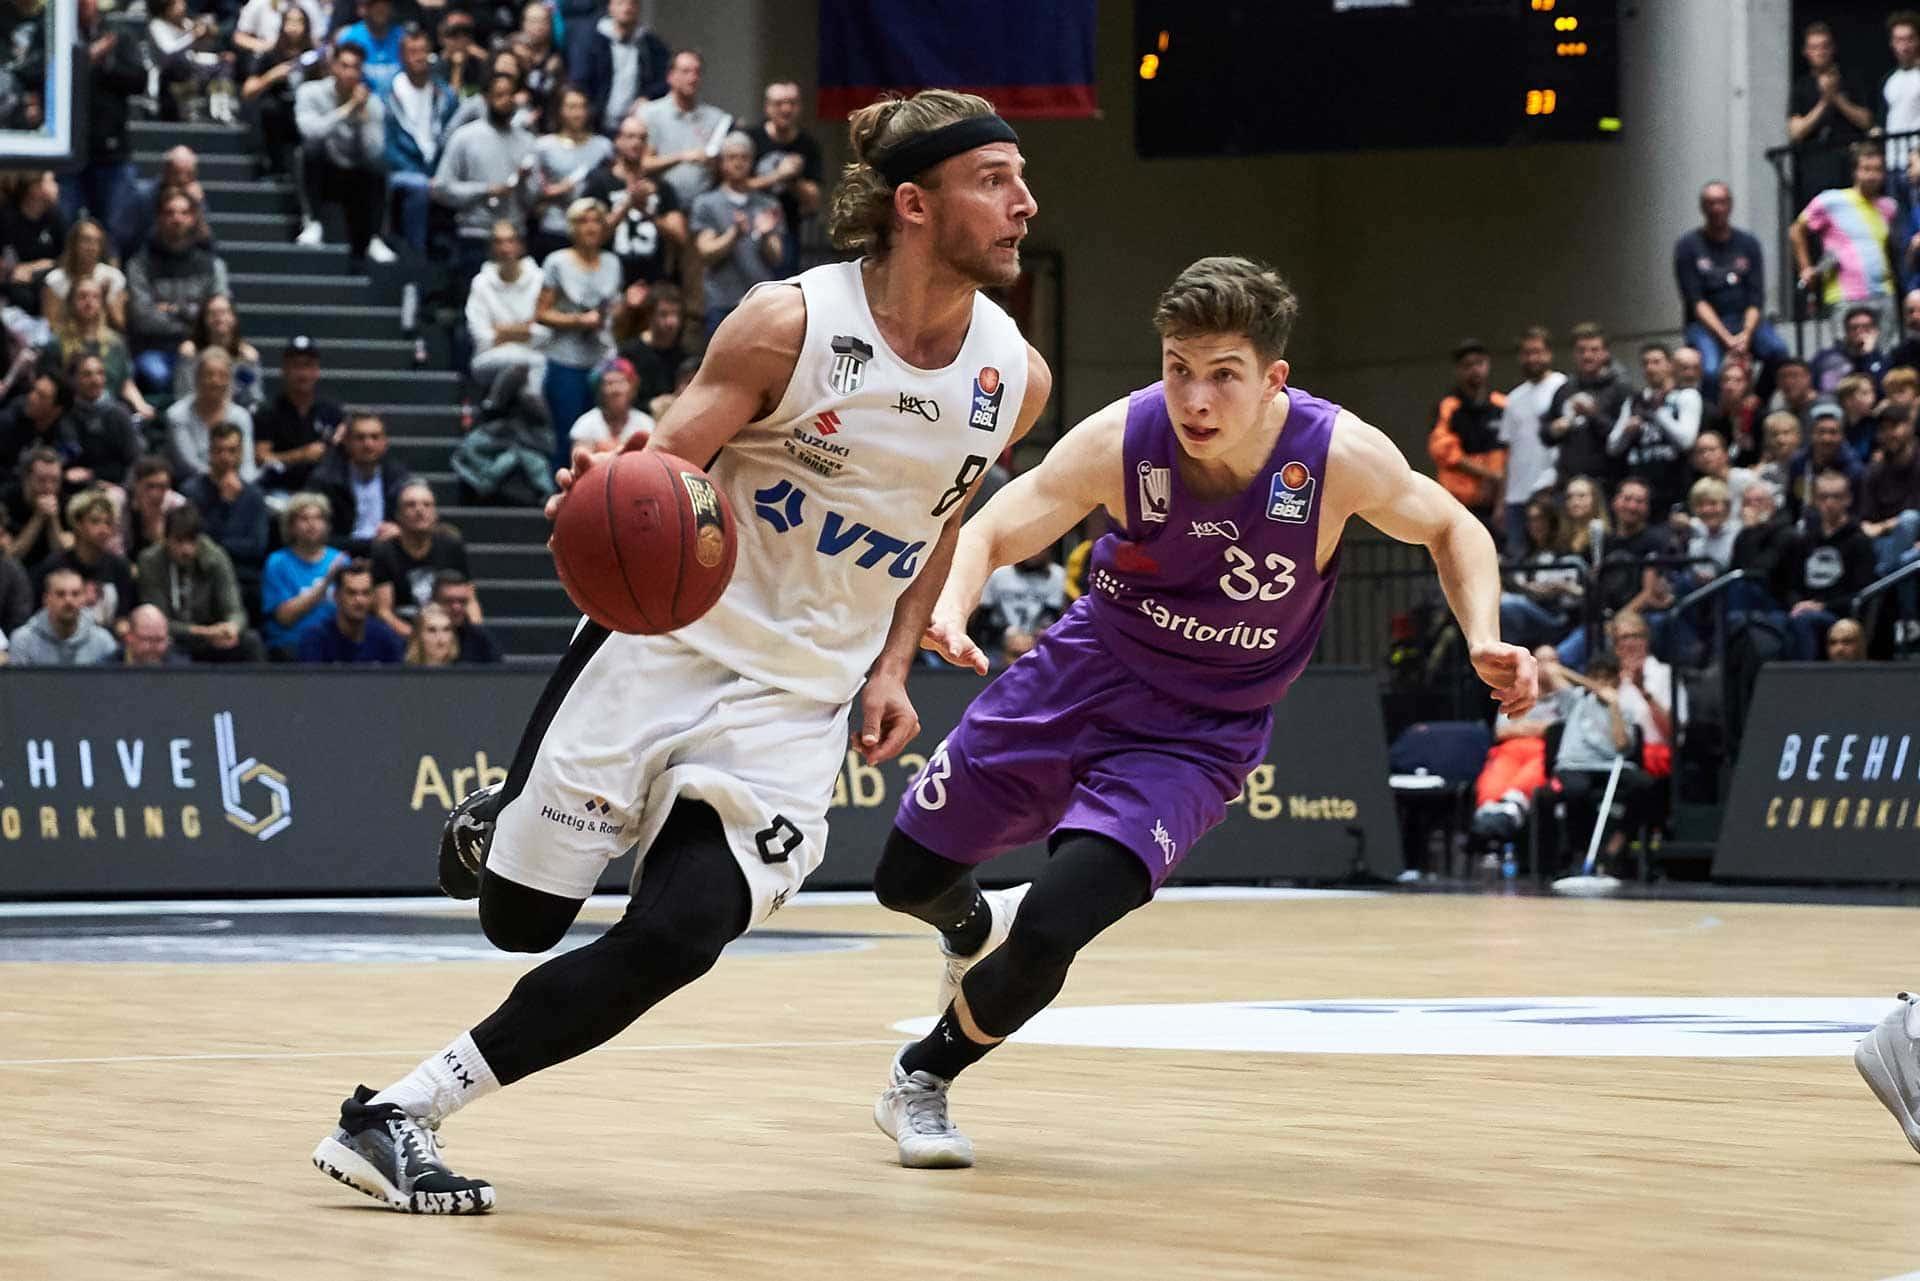 2019.11.16 Towers vs Goettingen DF 204 webbesser - Wie Basketball Menschen vereint